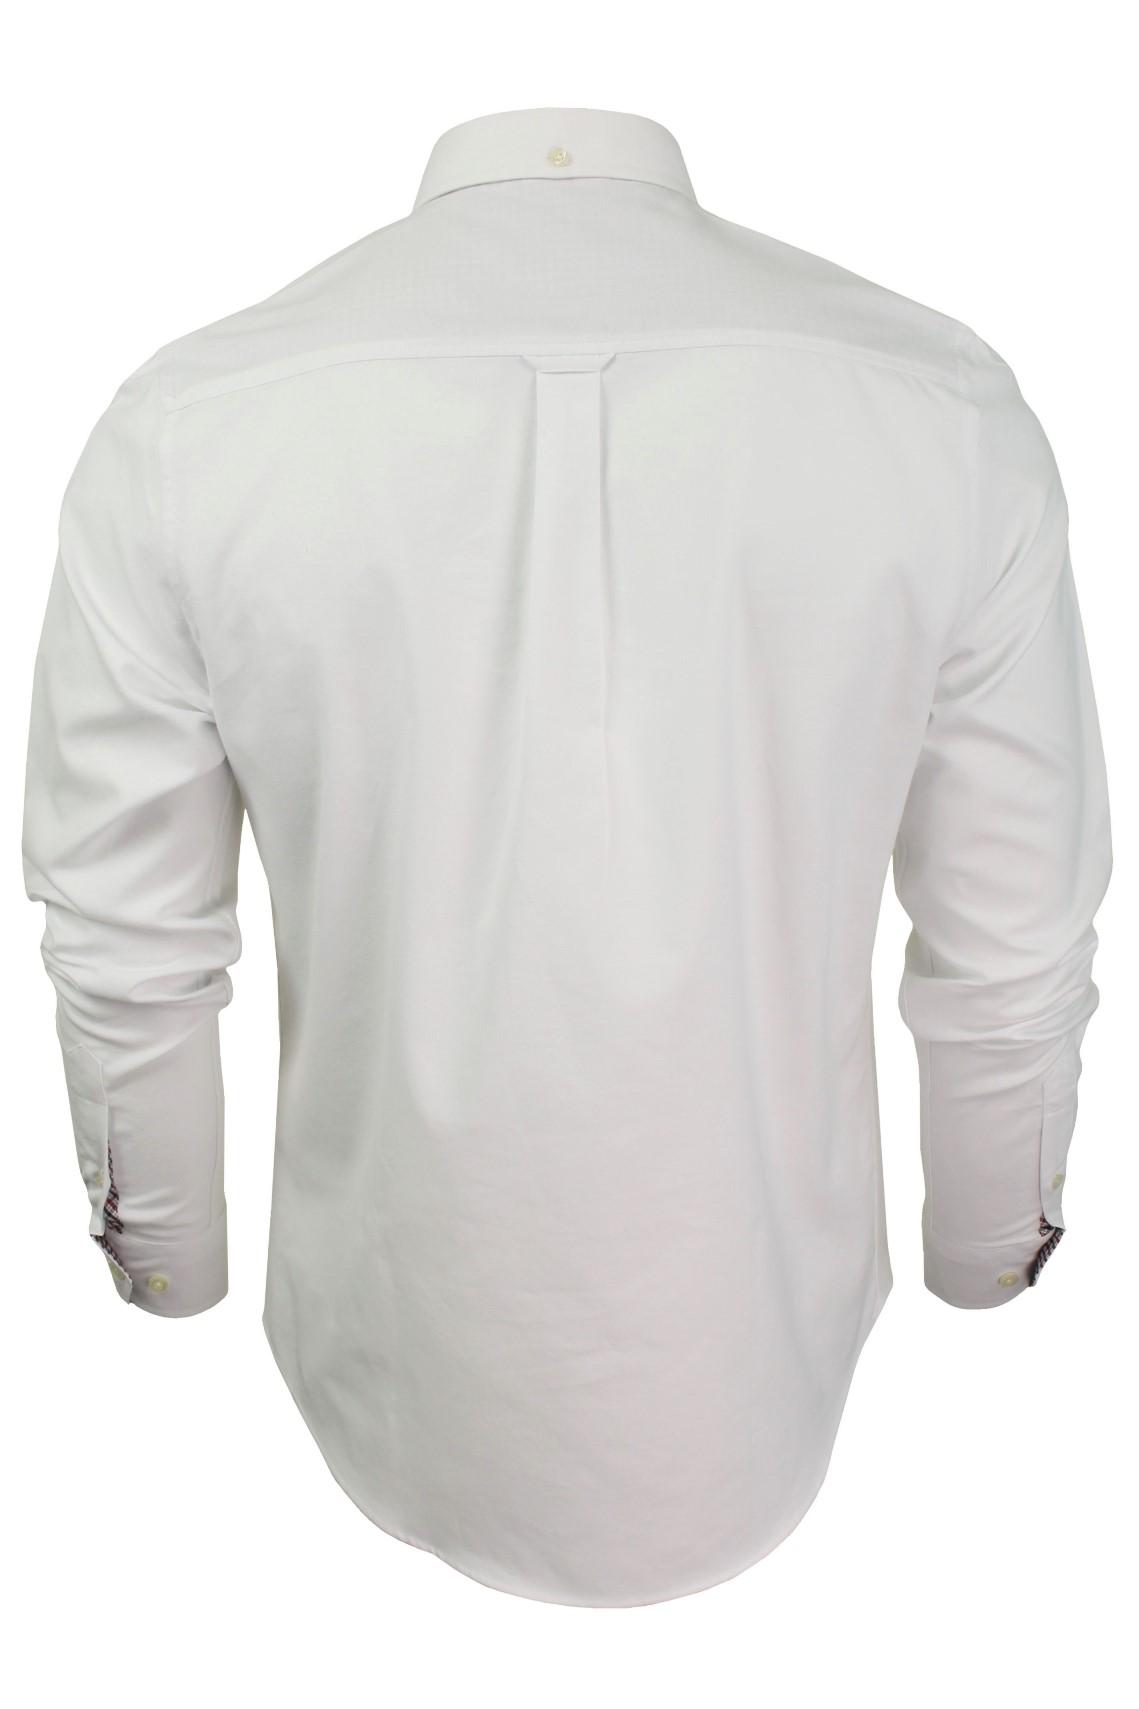 Mens-Oxford-Shirt-by-Ben-Sherman-Long-Sleeved miniatuur 28